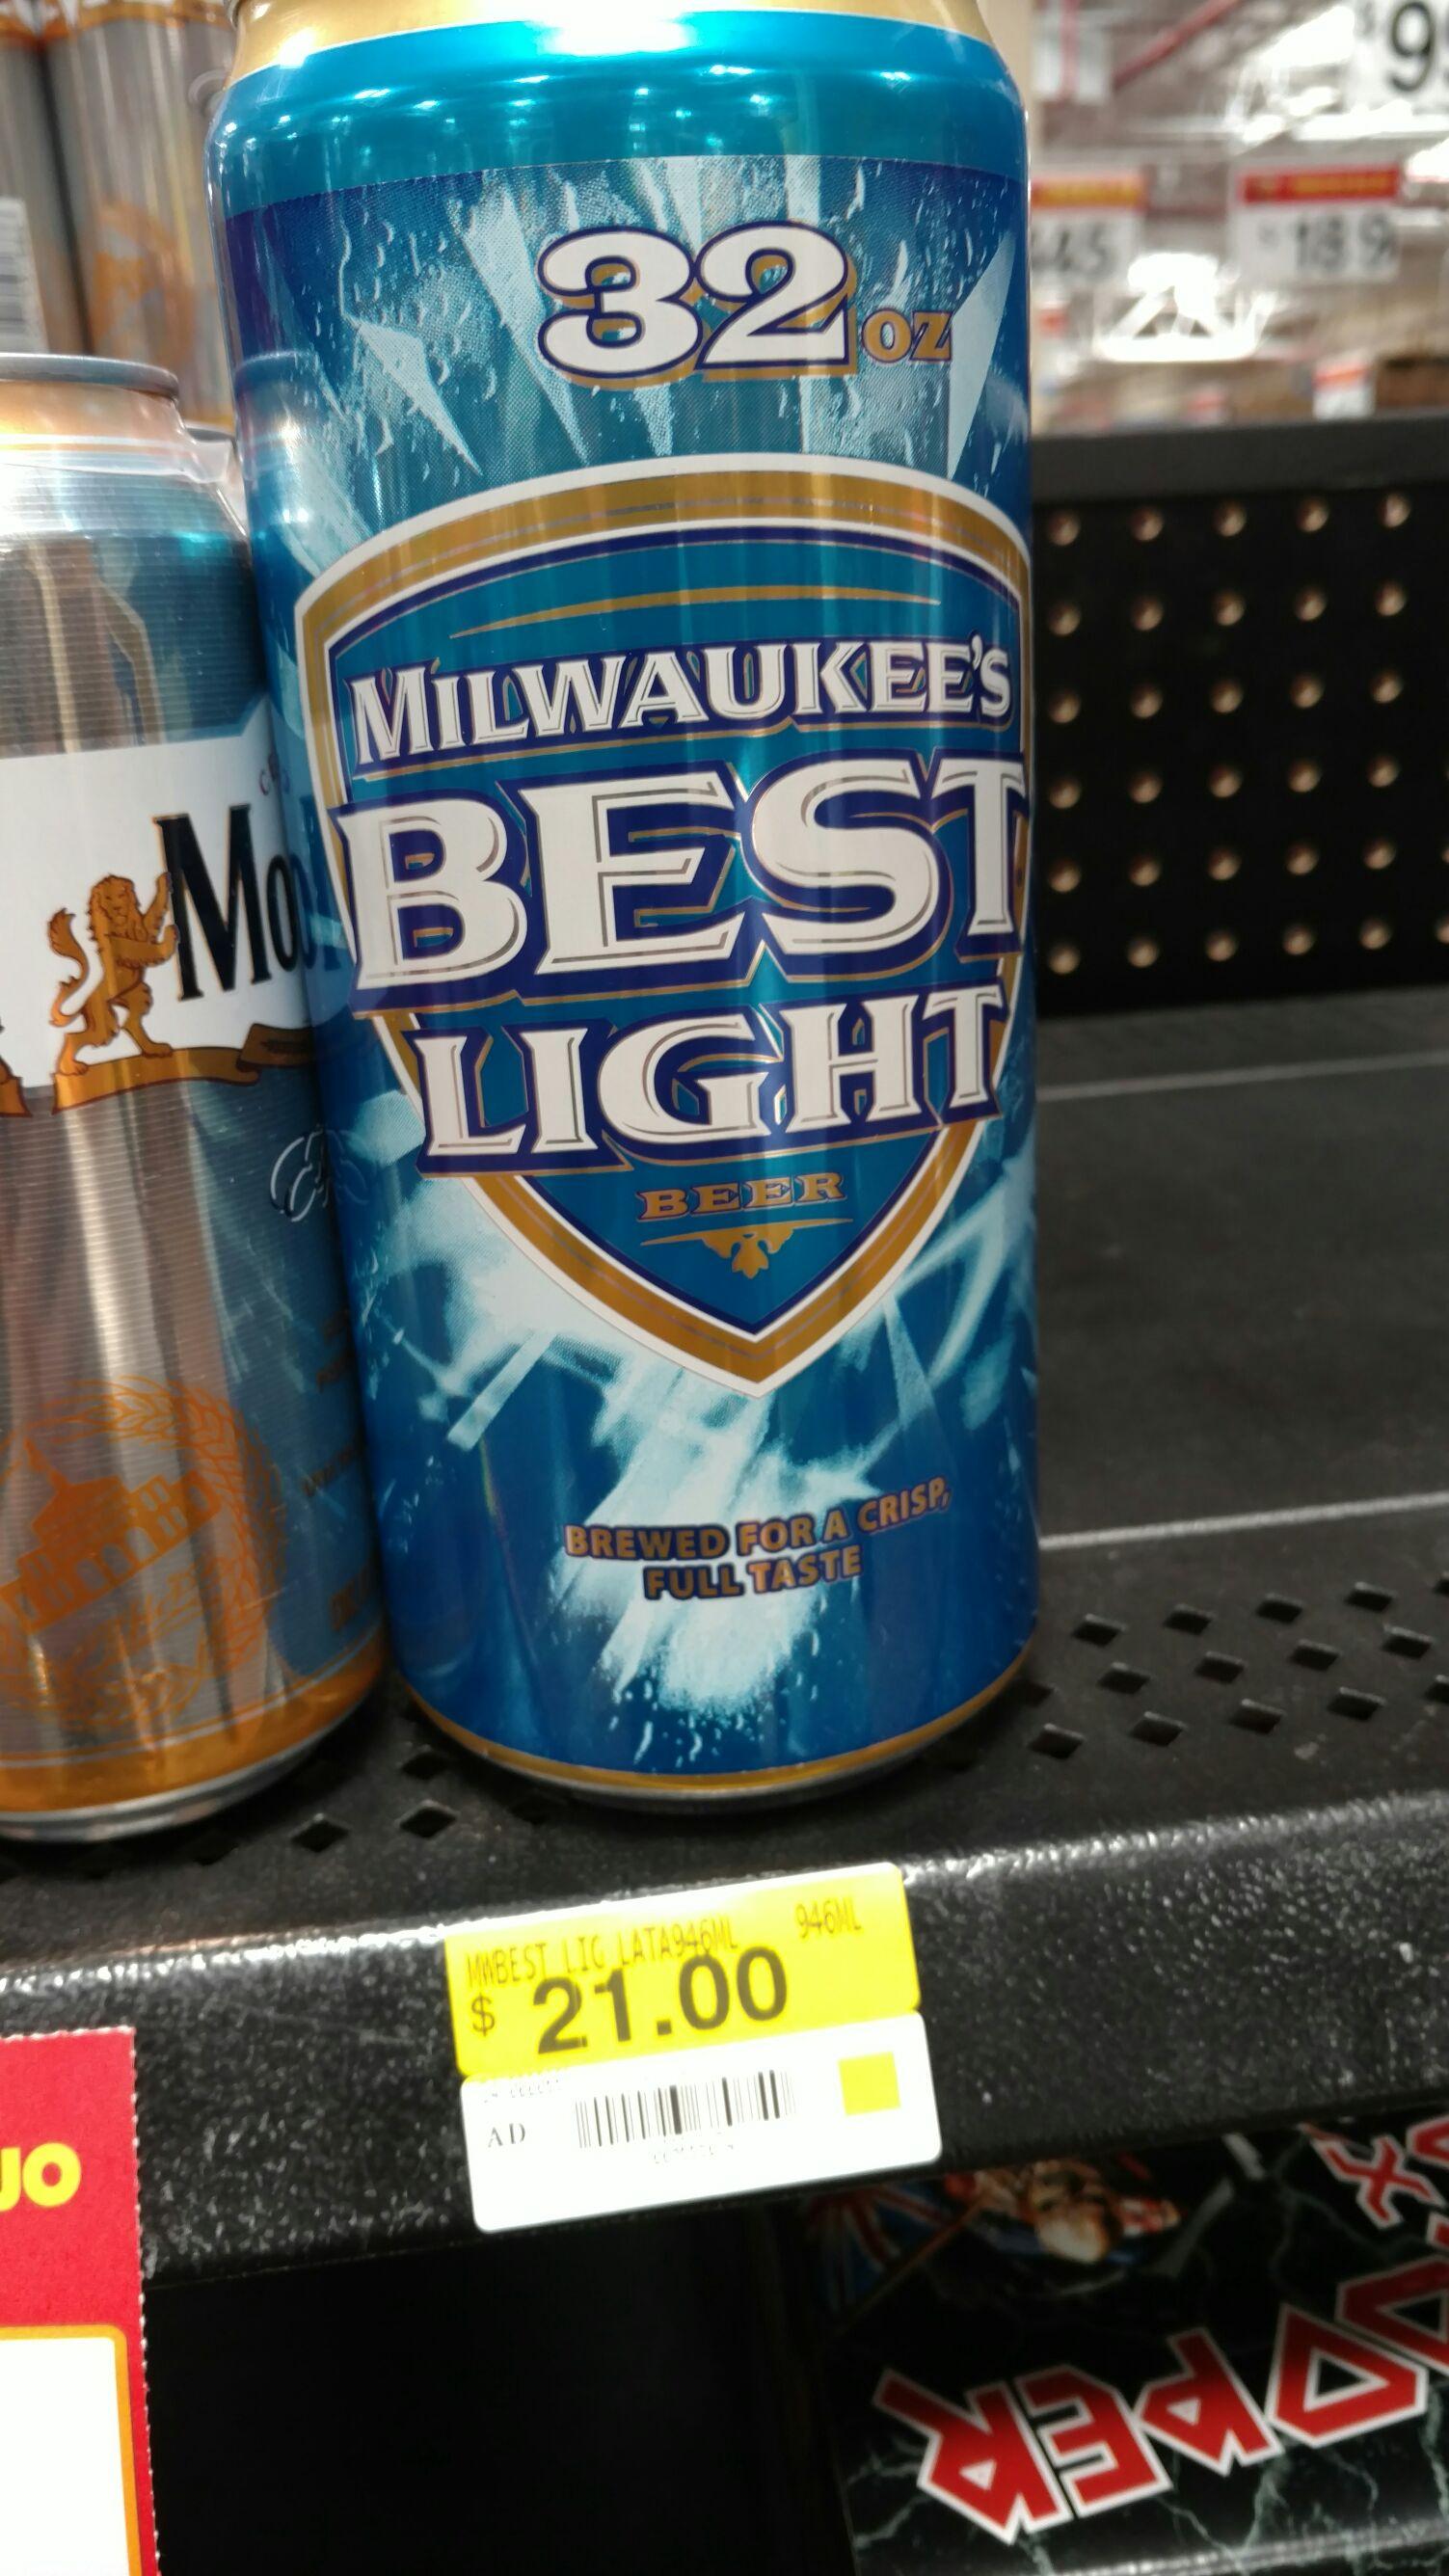 Walmart: Lata 946 ml Milwaukee's Best Light Beer